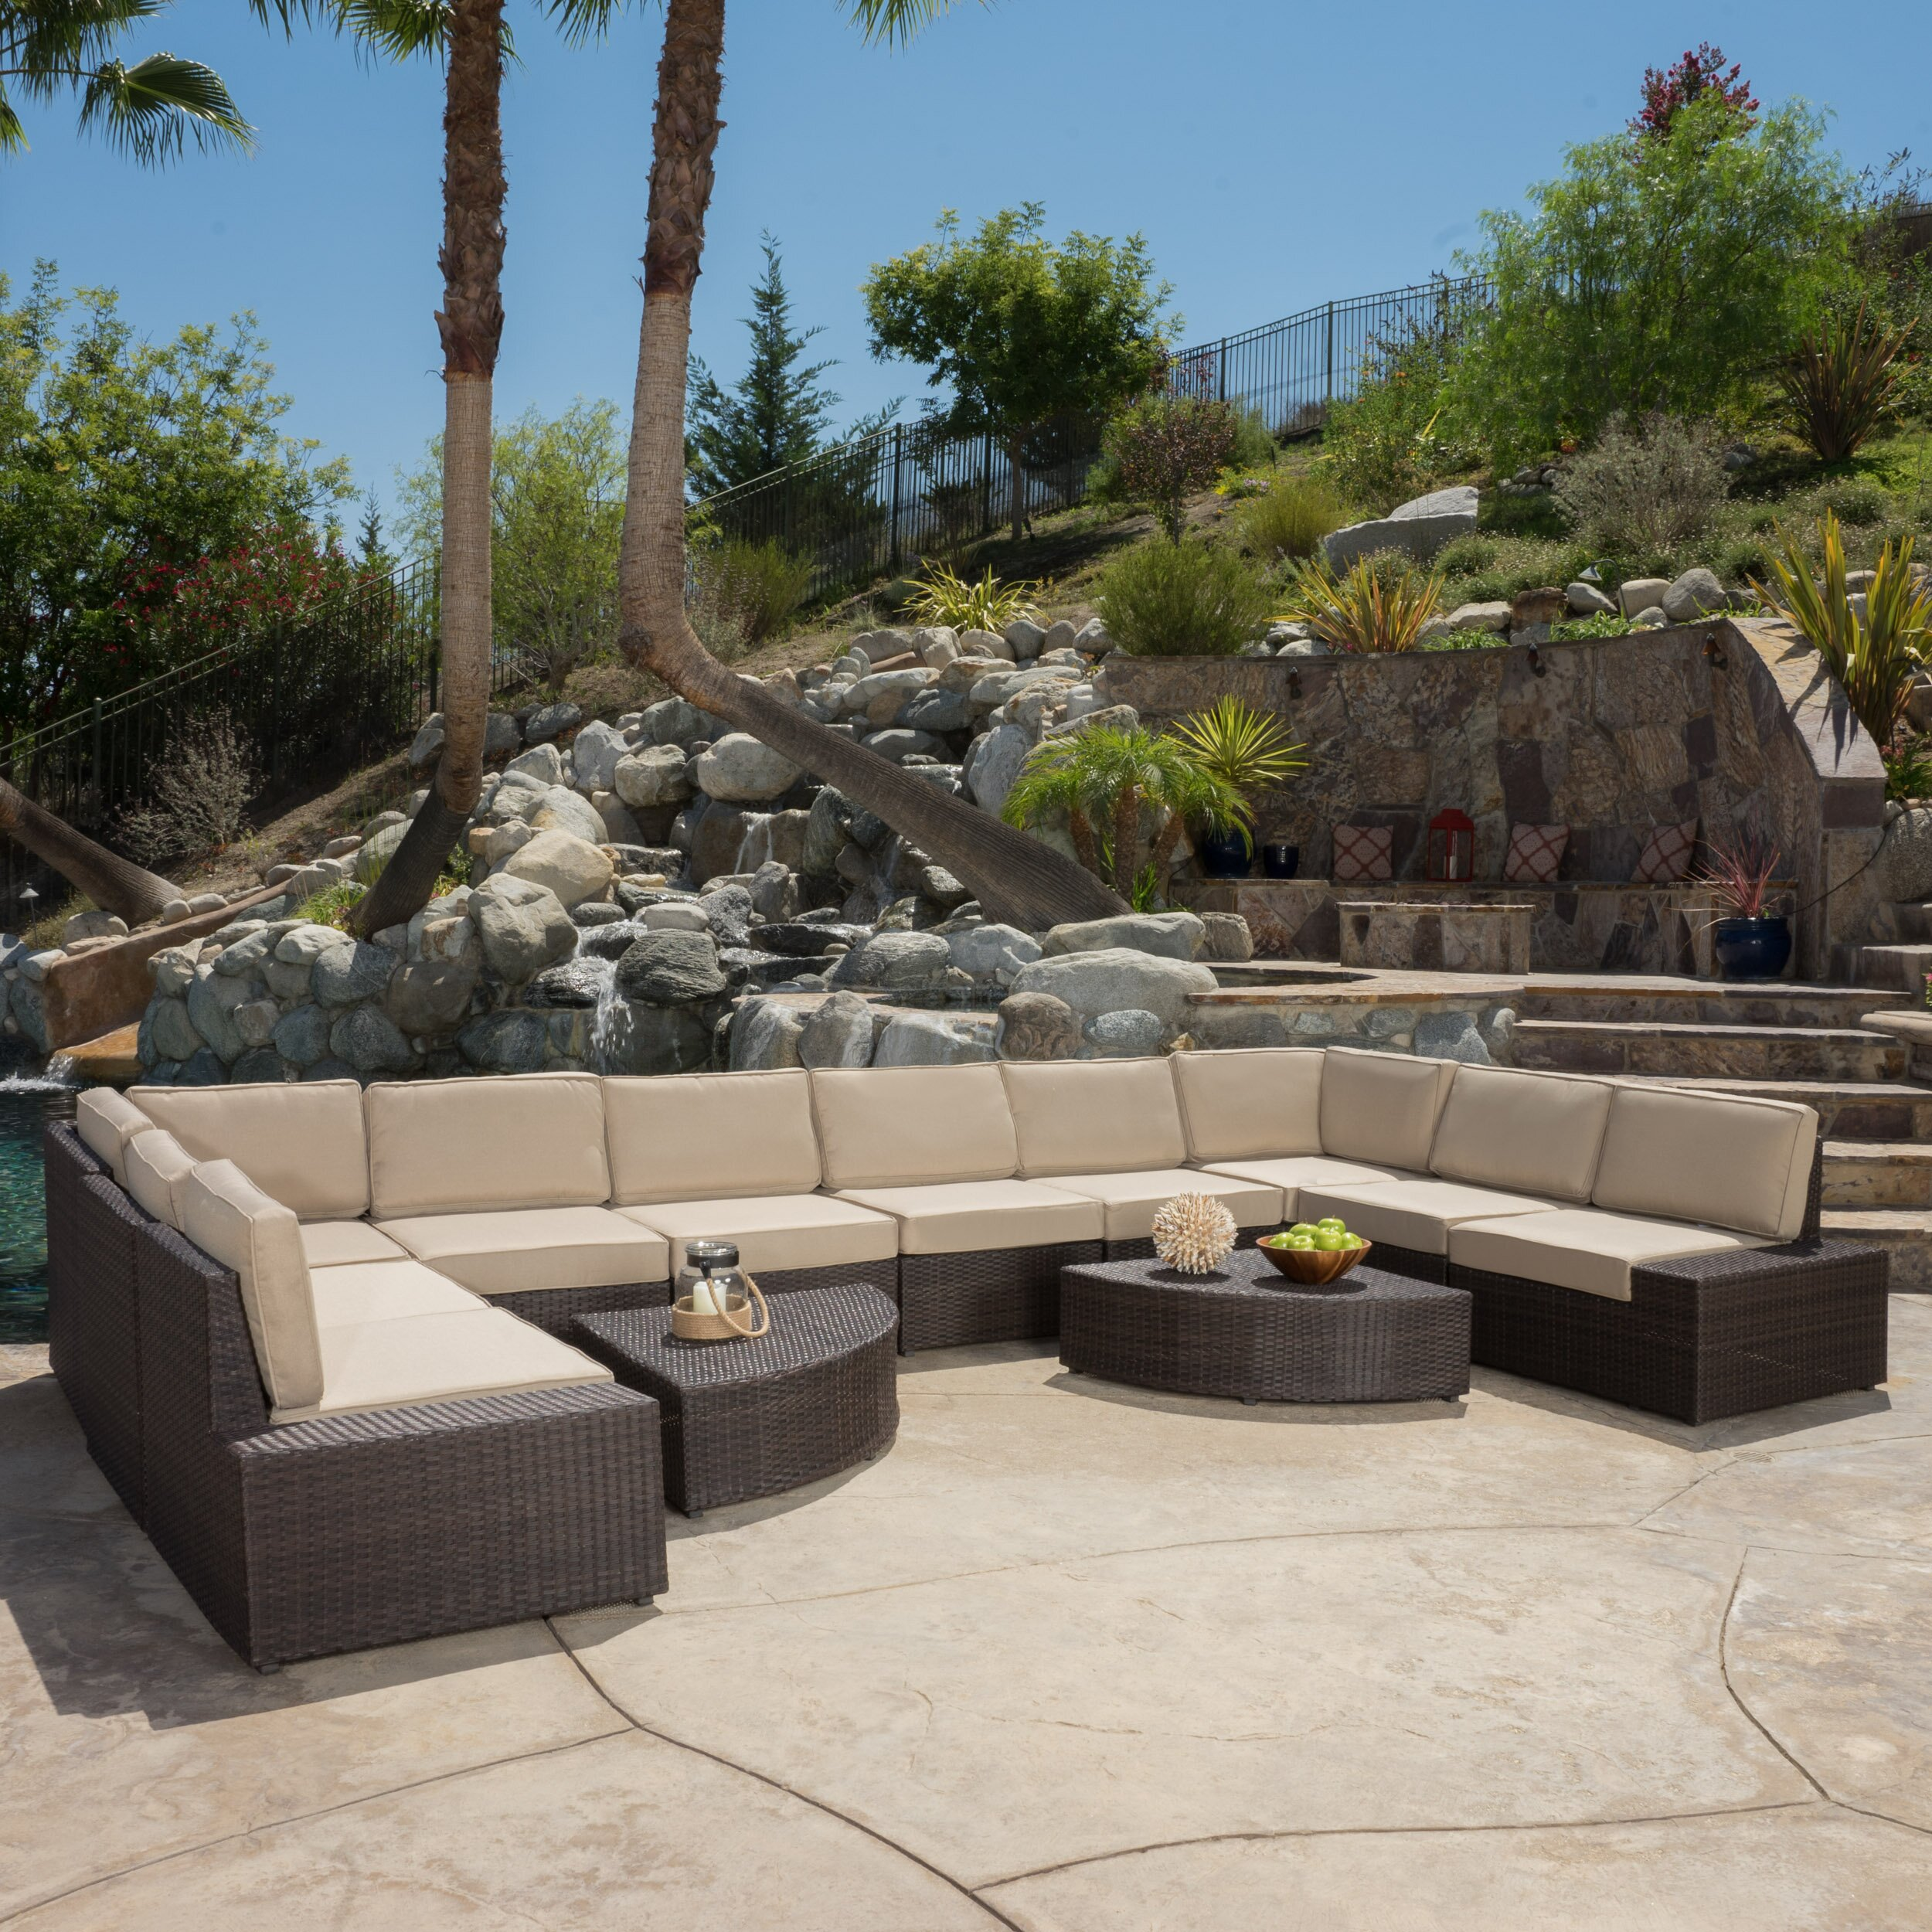 Brayden Studio Mariscal 12 Piece Deep Seating Group With Cushions Reviews Wayfair Supply